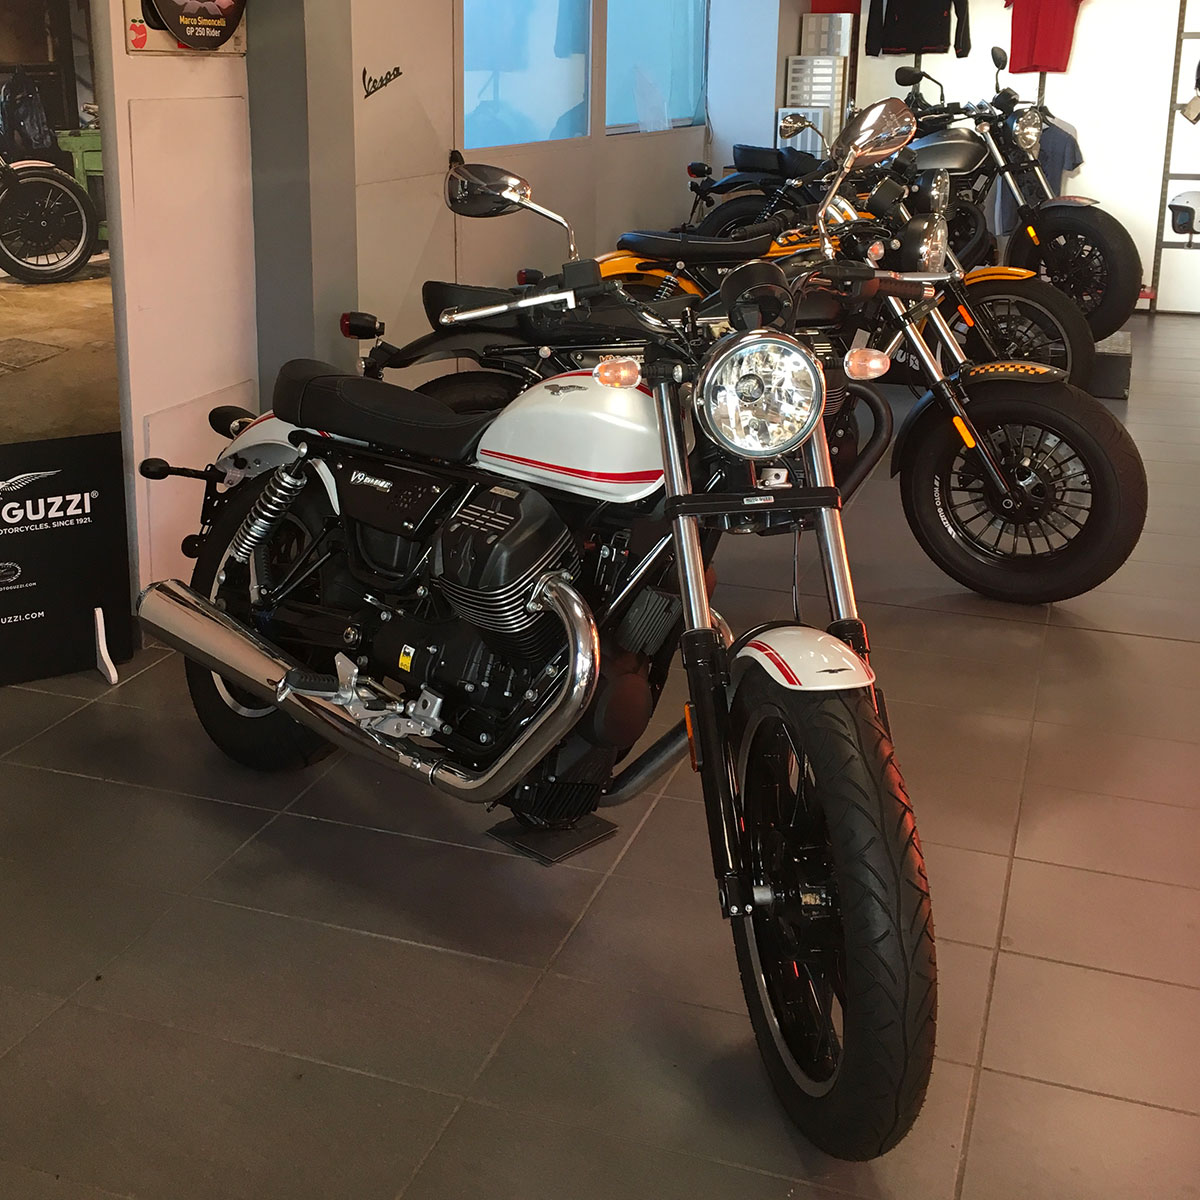 Sissi Moto Crema Usato moto usate - vendita a como e erba | moto giussani